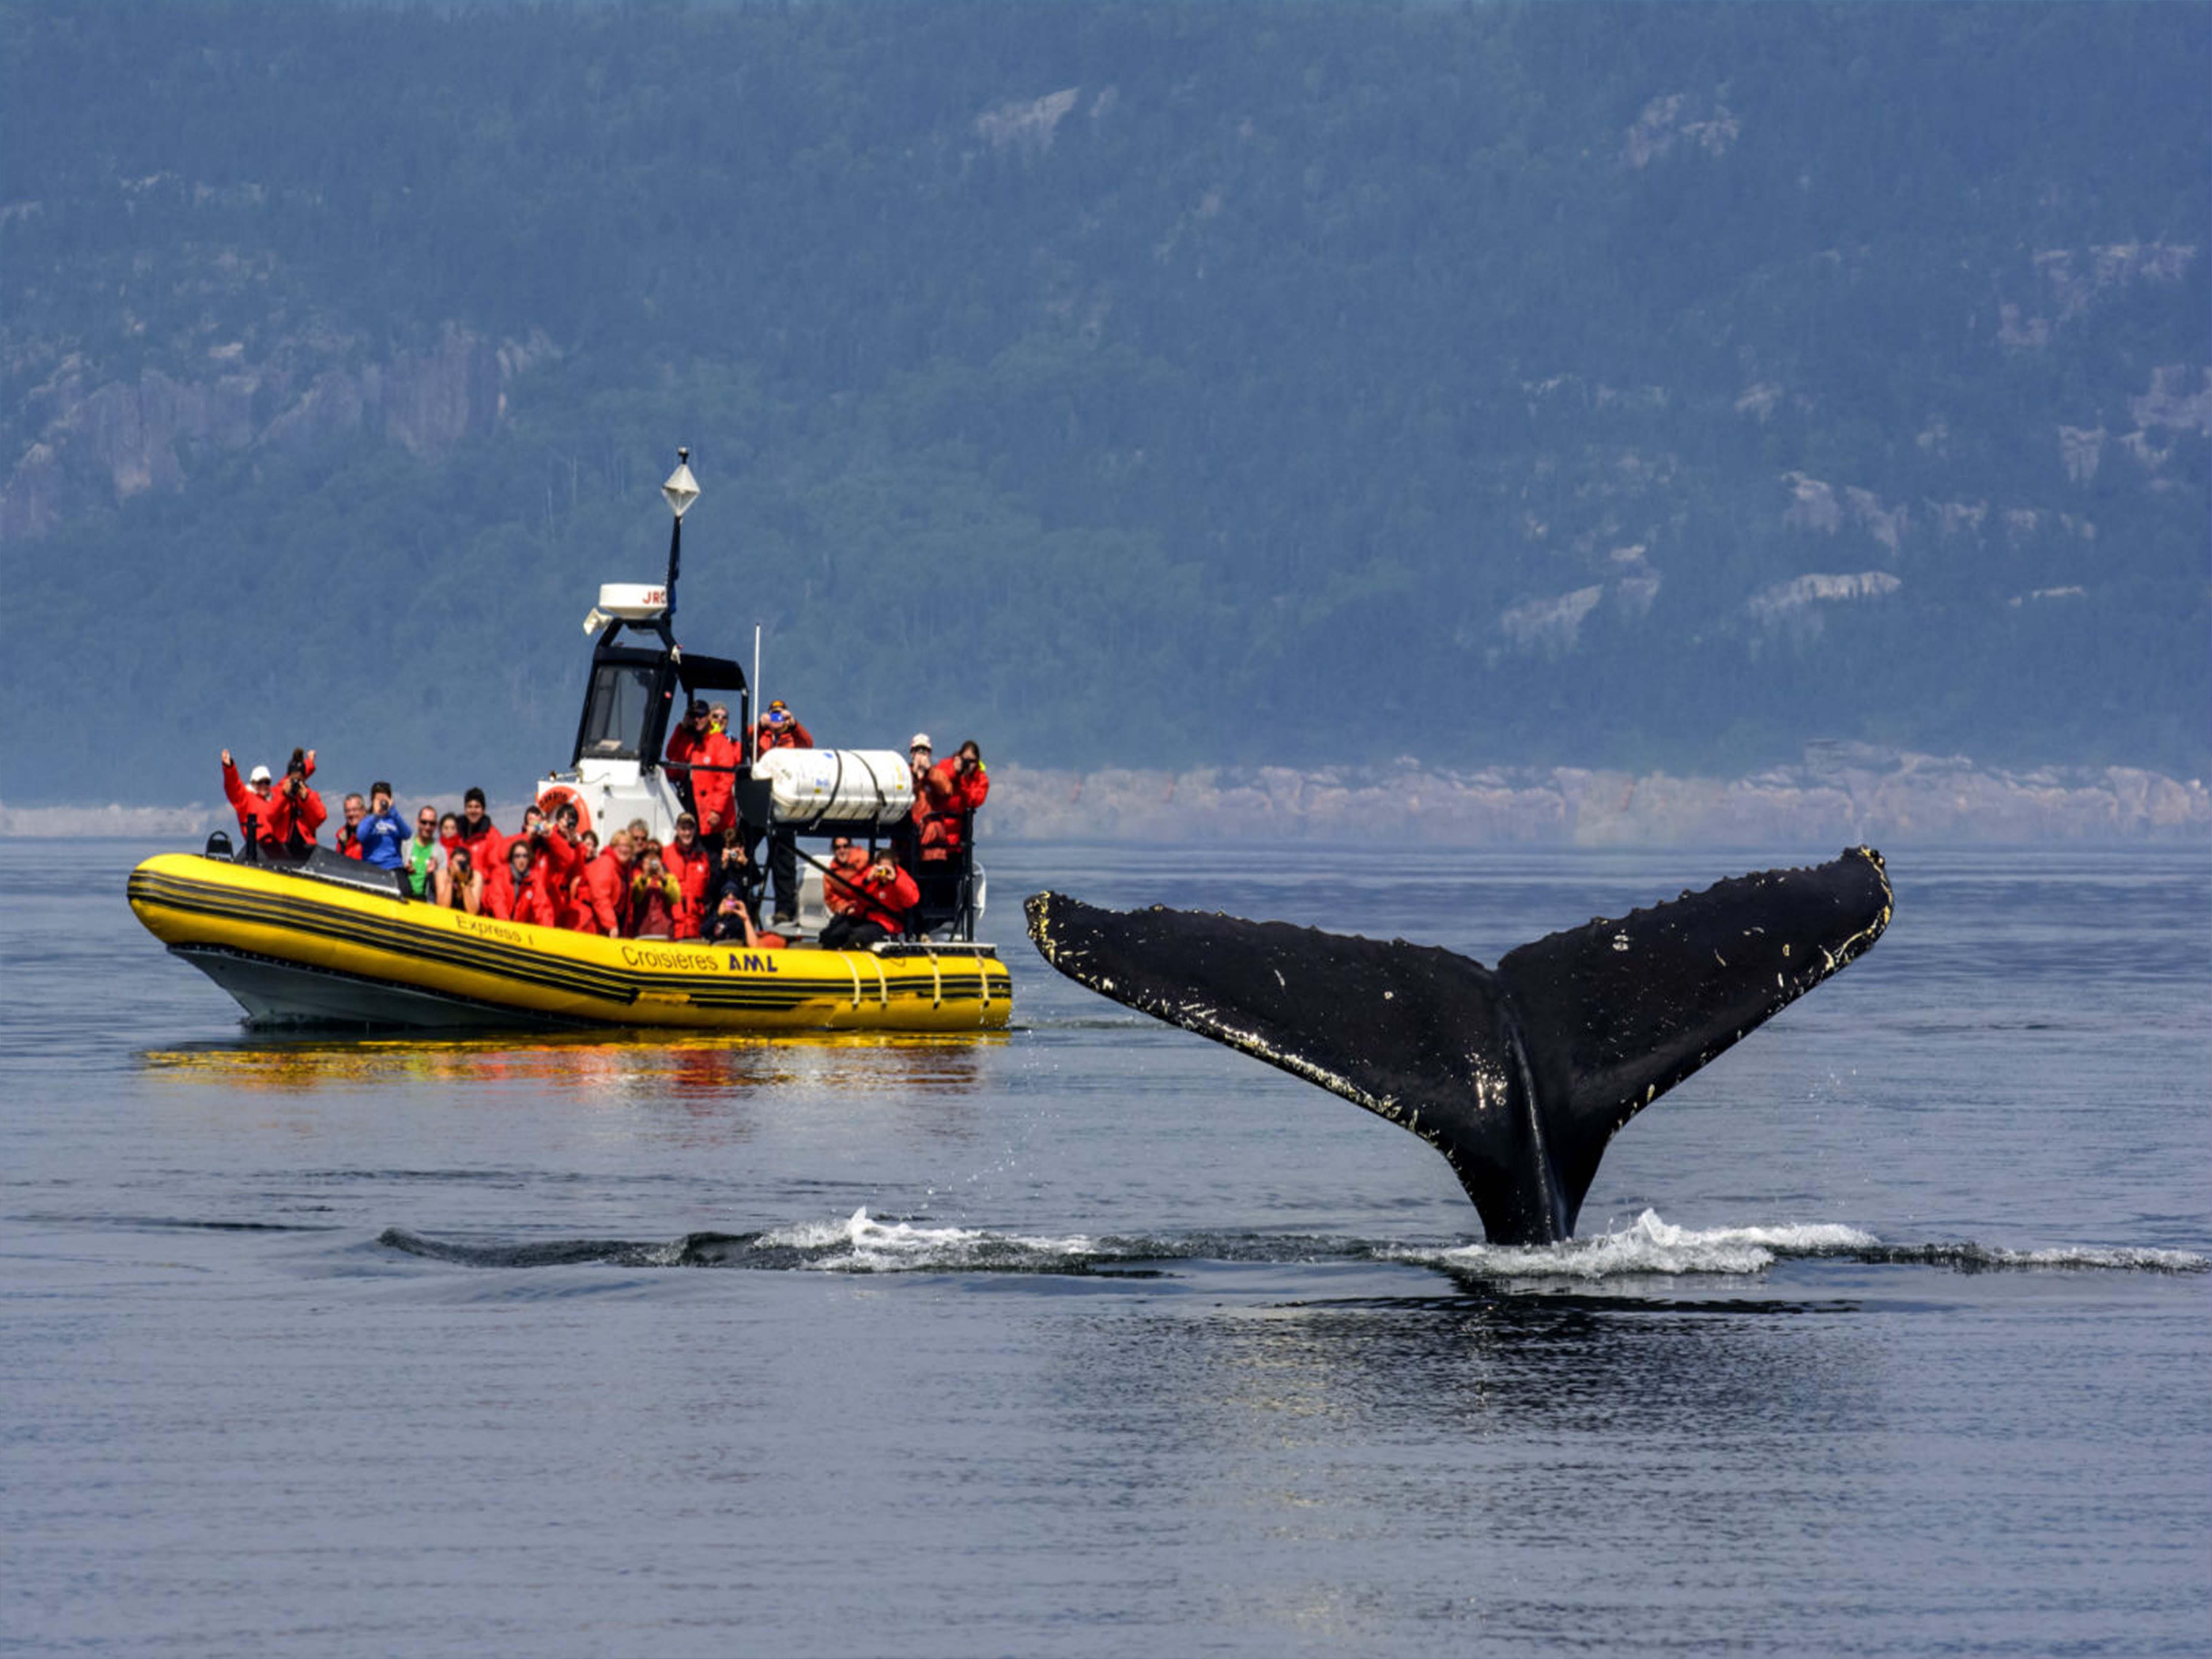 http://www.capauleste.com/wp-content/uploads/2016/02/Croisiere-baleines.jpg